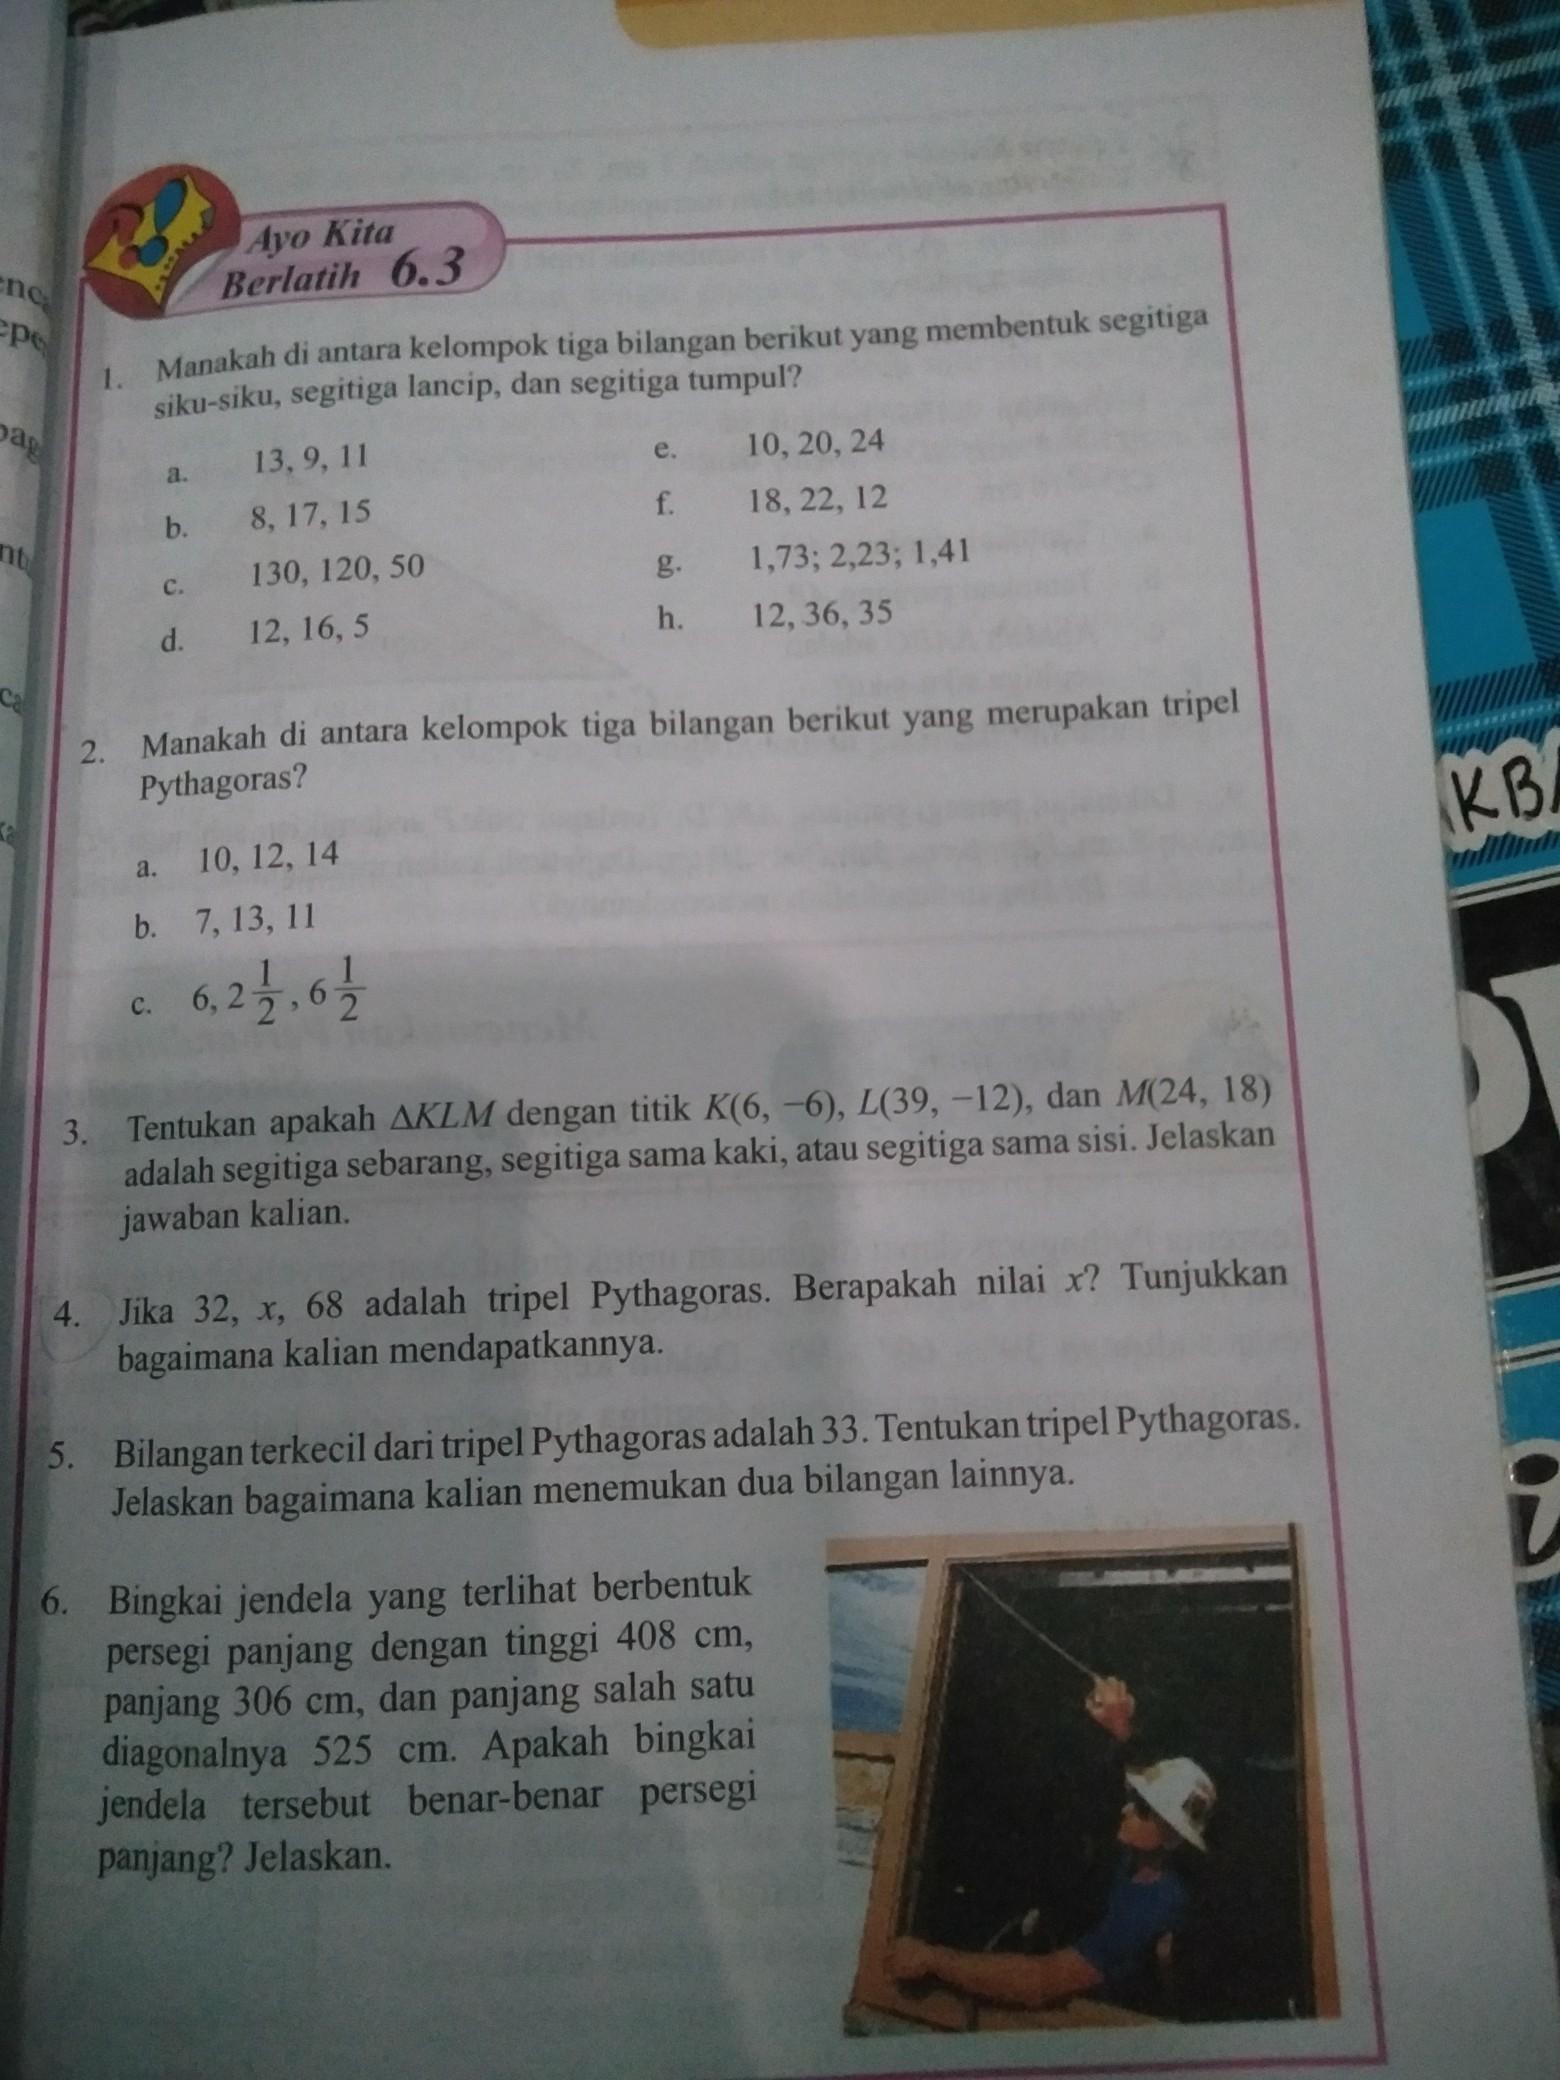 Jawaban Ipa Kelas 8 Semester 2 Halaman 41 Rismax